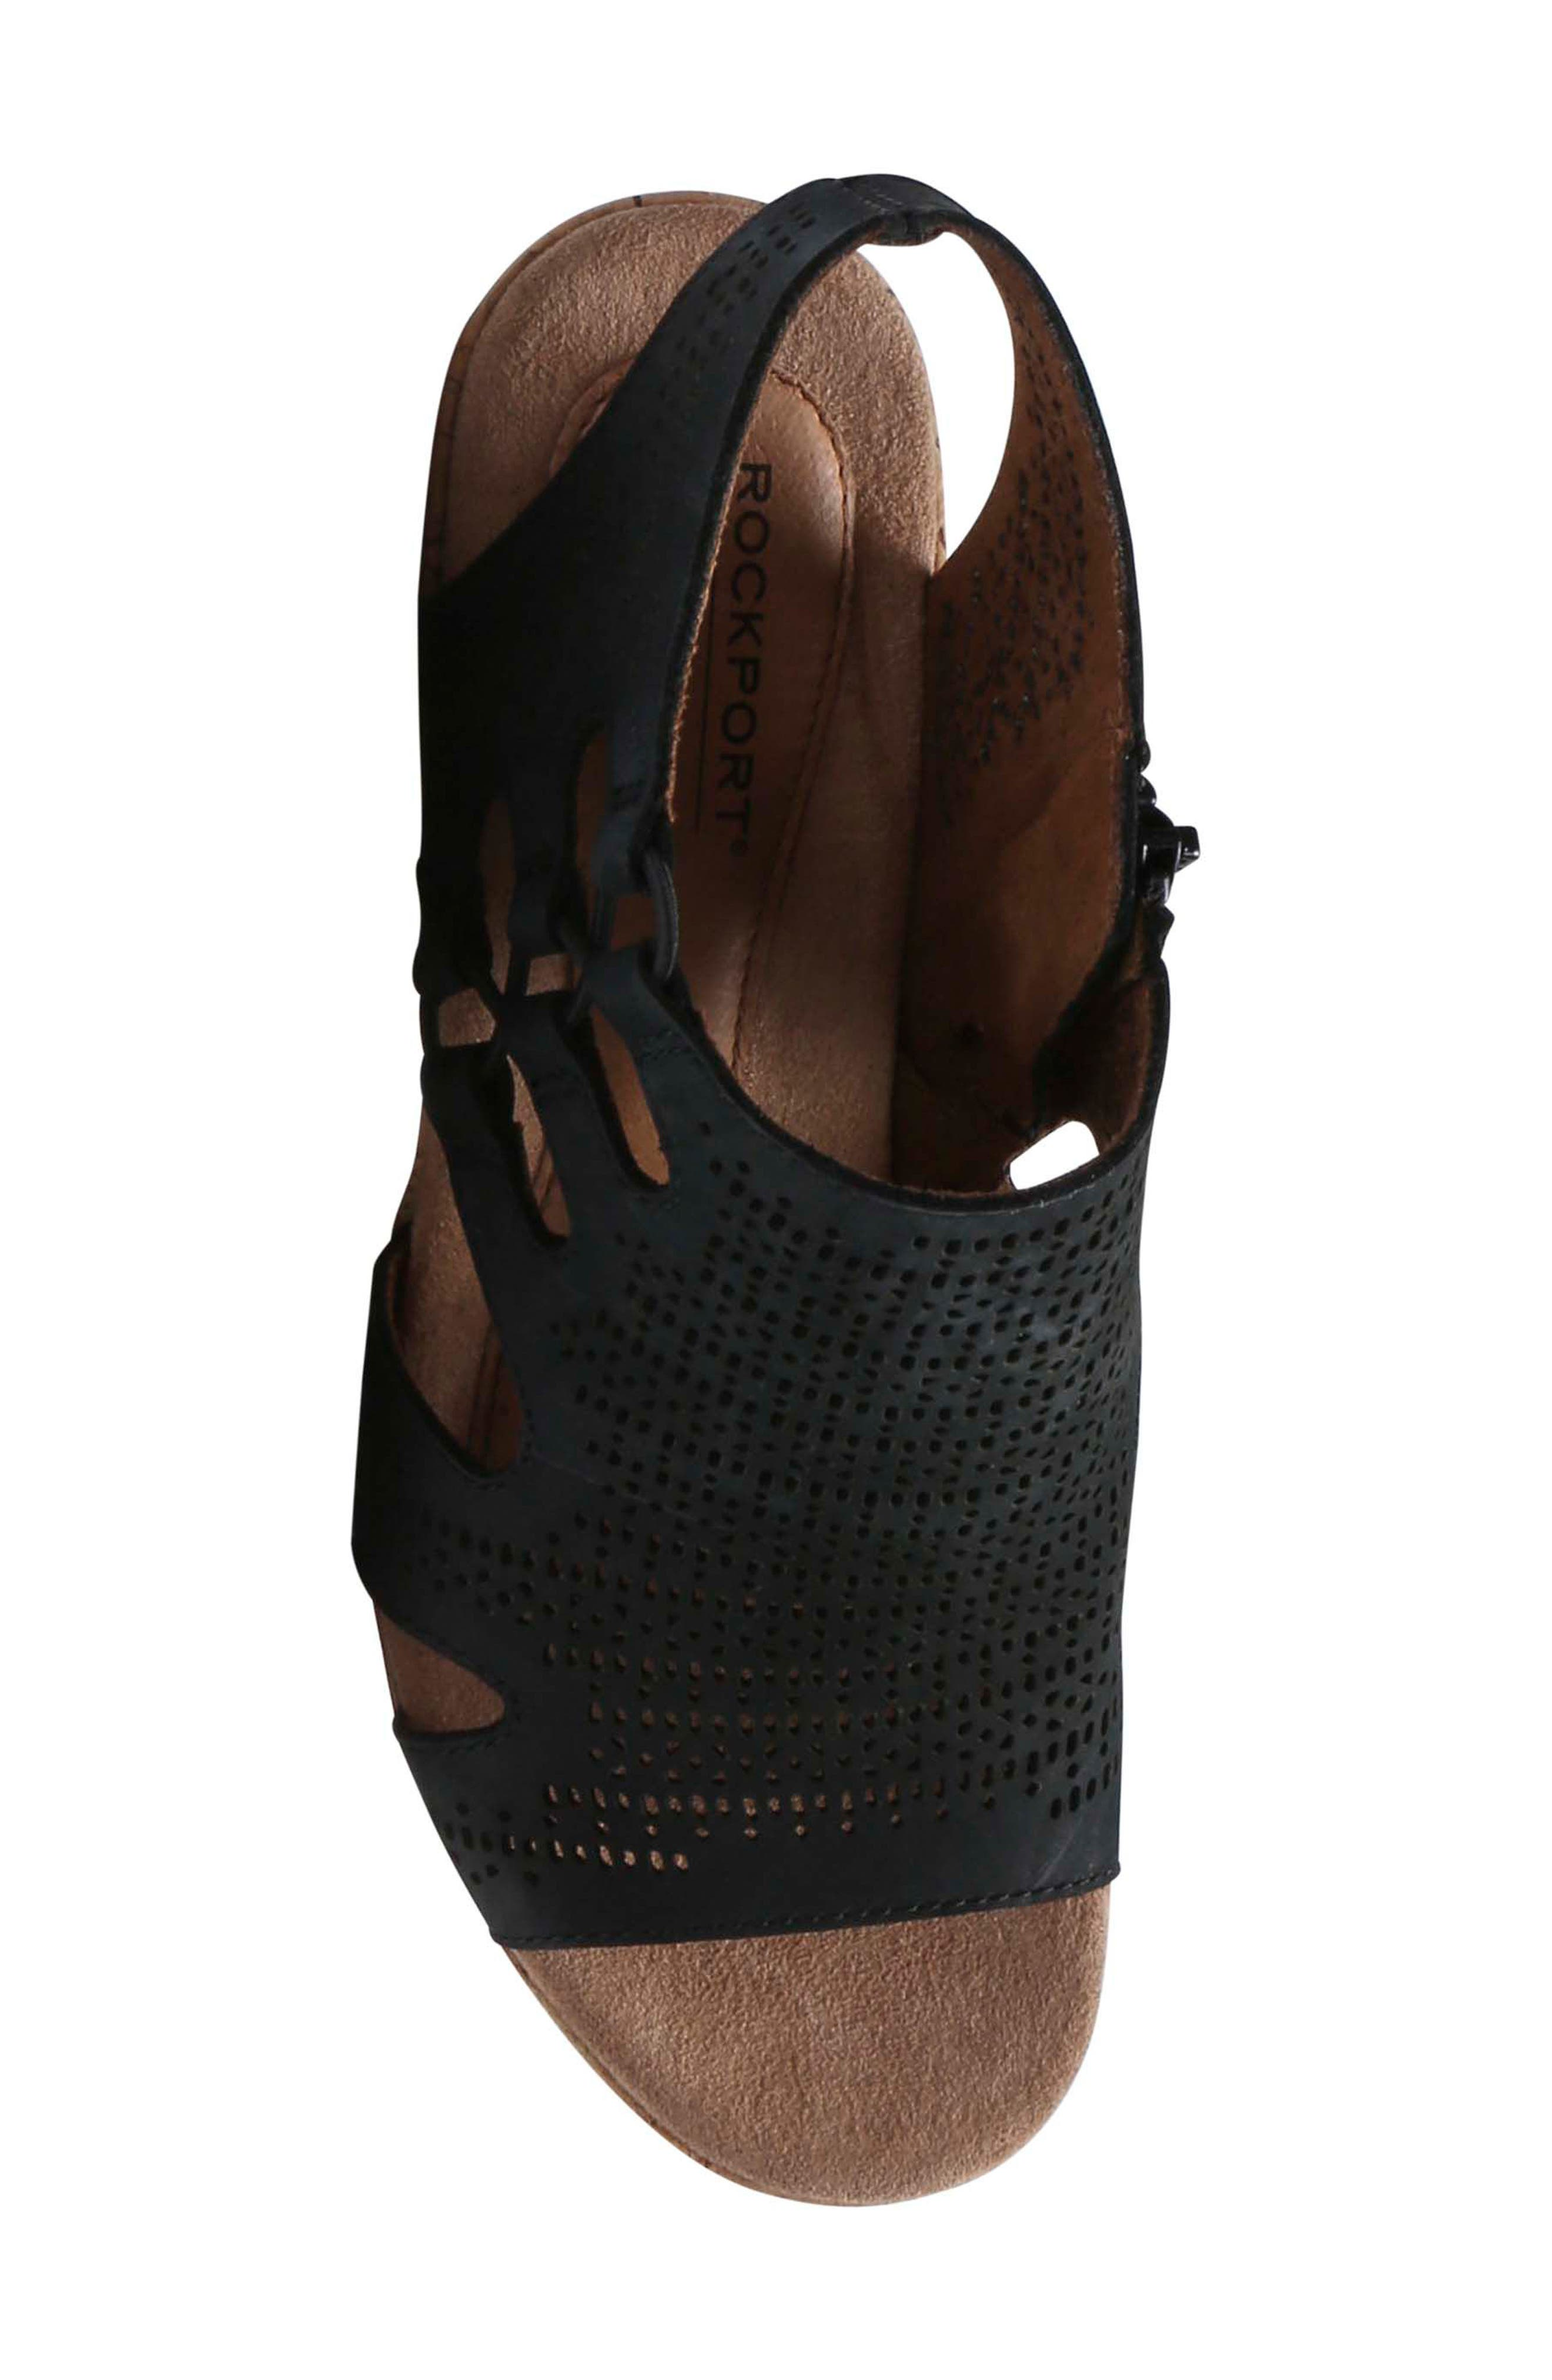 Janna Perforated Wedge Sandal,                             Alternate thumbnail 5, color,                             BLACK NUBUCK LEATHER